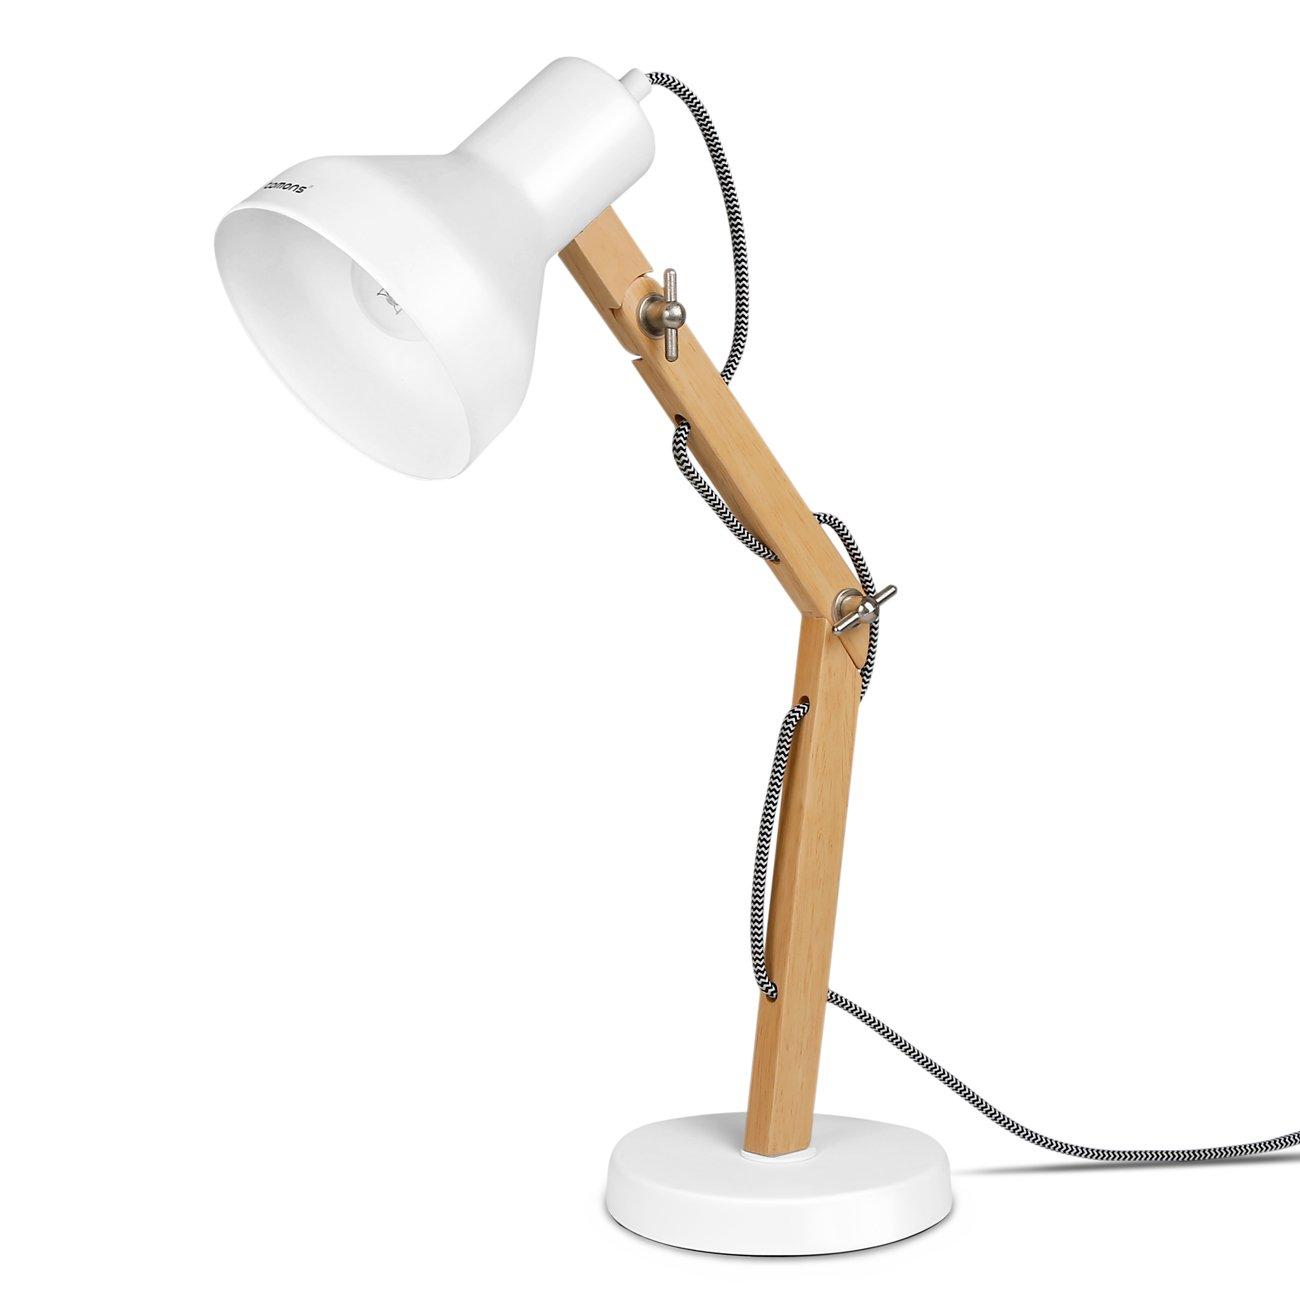 Tomons Wood Adjustable Head Desk Lamp, Designer Table Lamp, Reading Lights, Study Lamp, Work Lamp, Office Lamp, Bedside Nightstand Lamp - Black